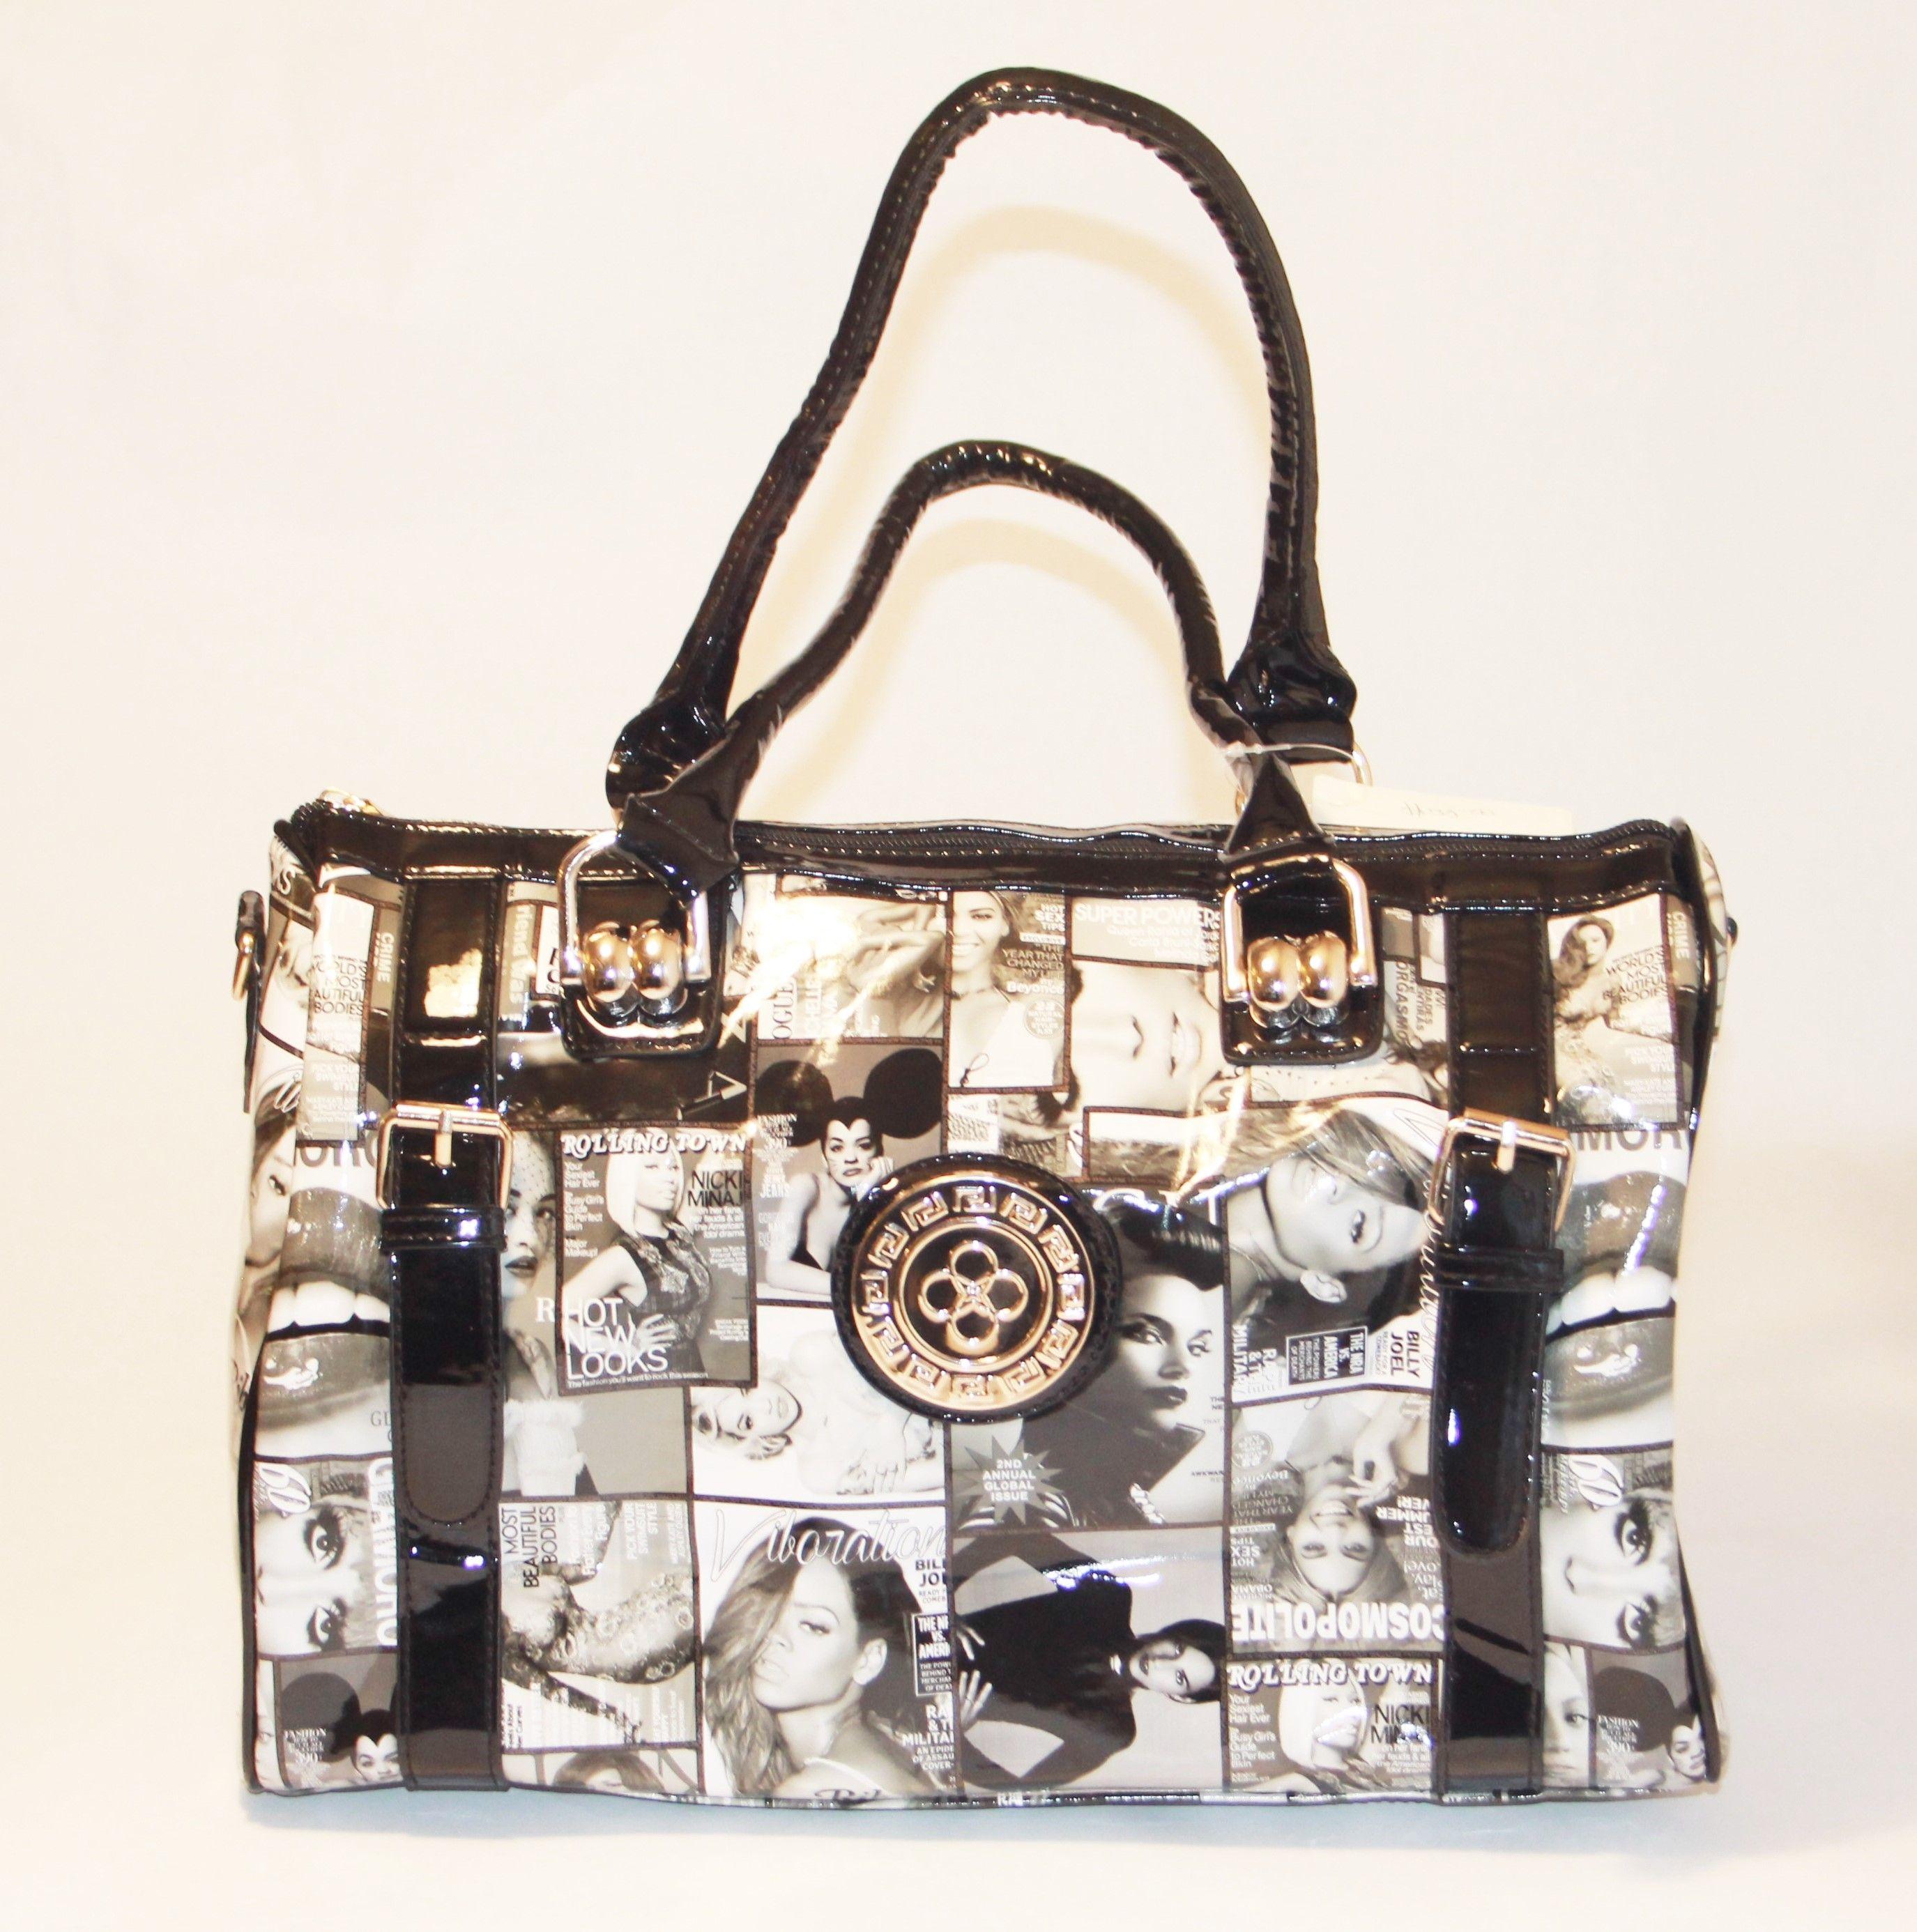 Handbags Magazines Purses Journals Hand Bags Magazine Women S Clutches